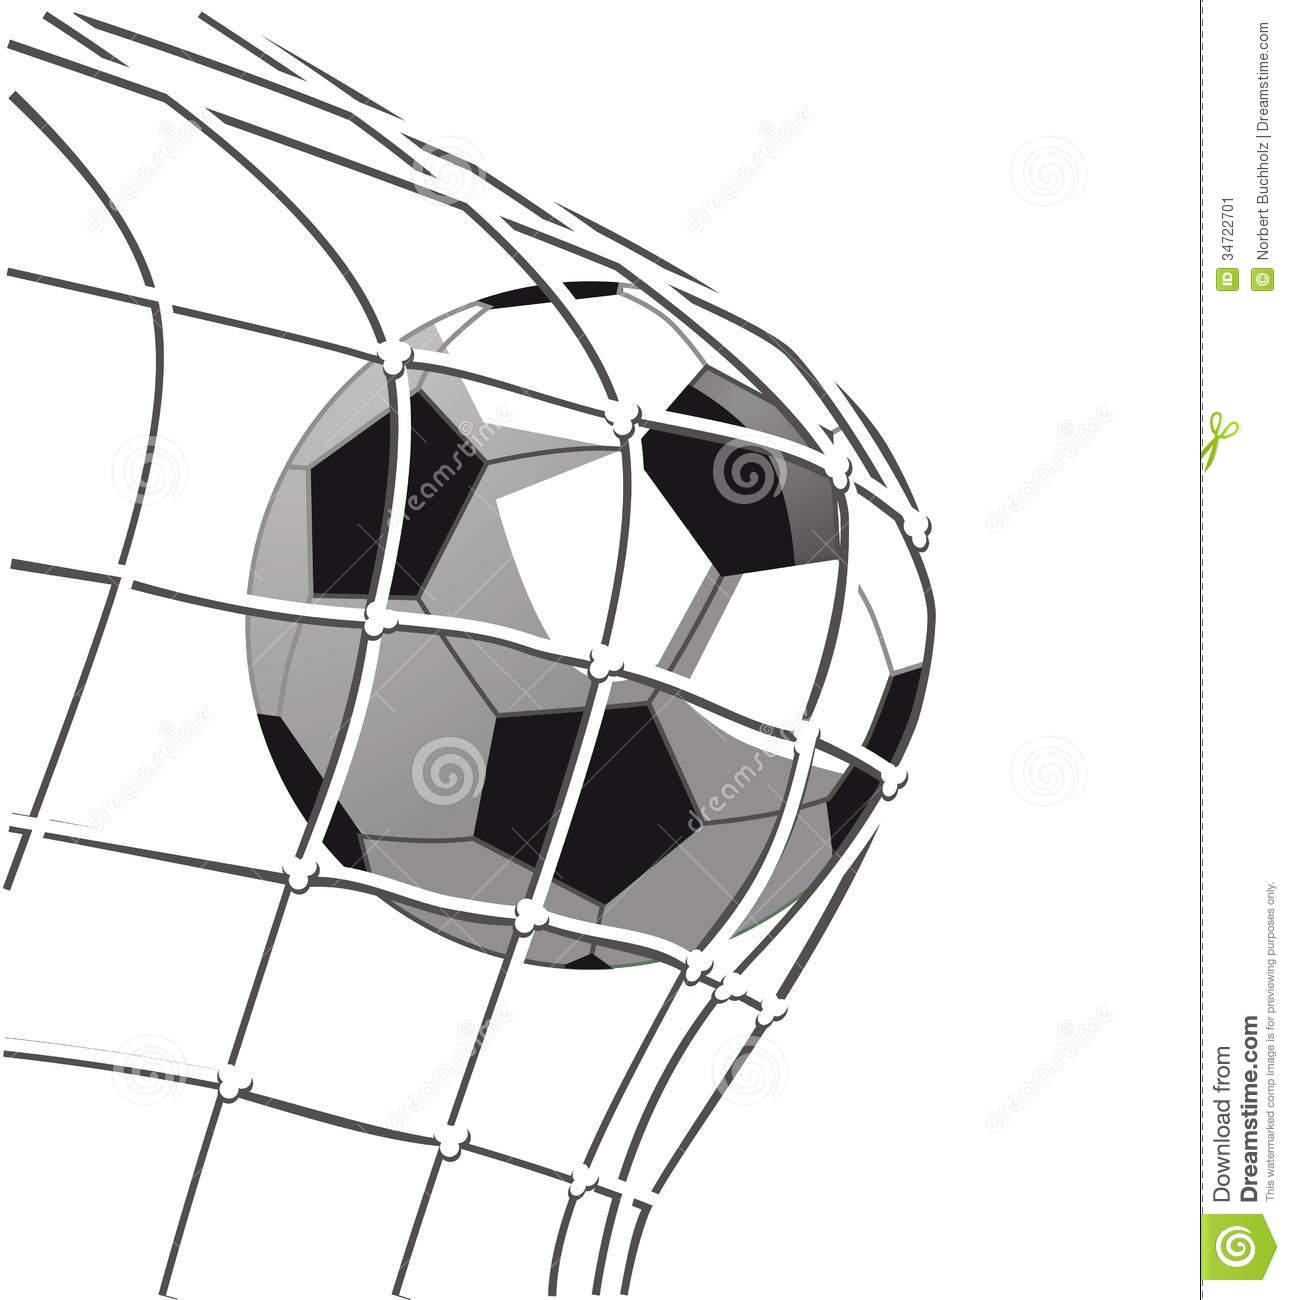 1290x1300 Soccer Goal Clip Art